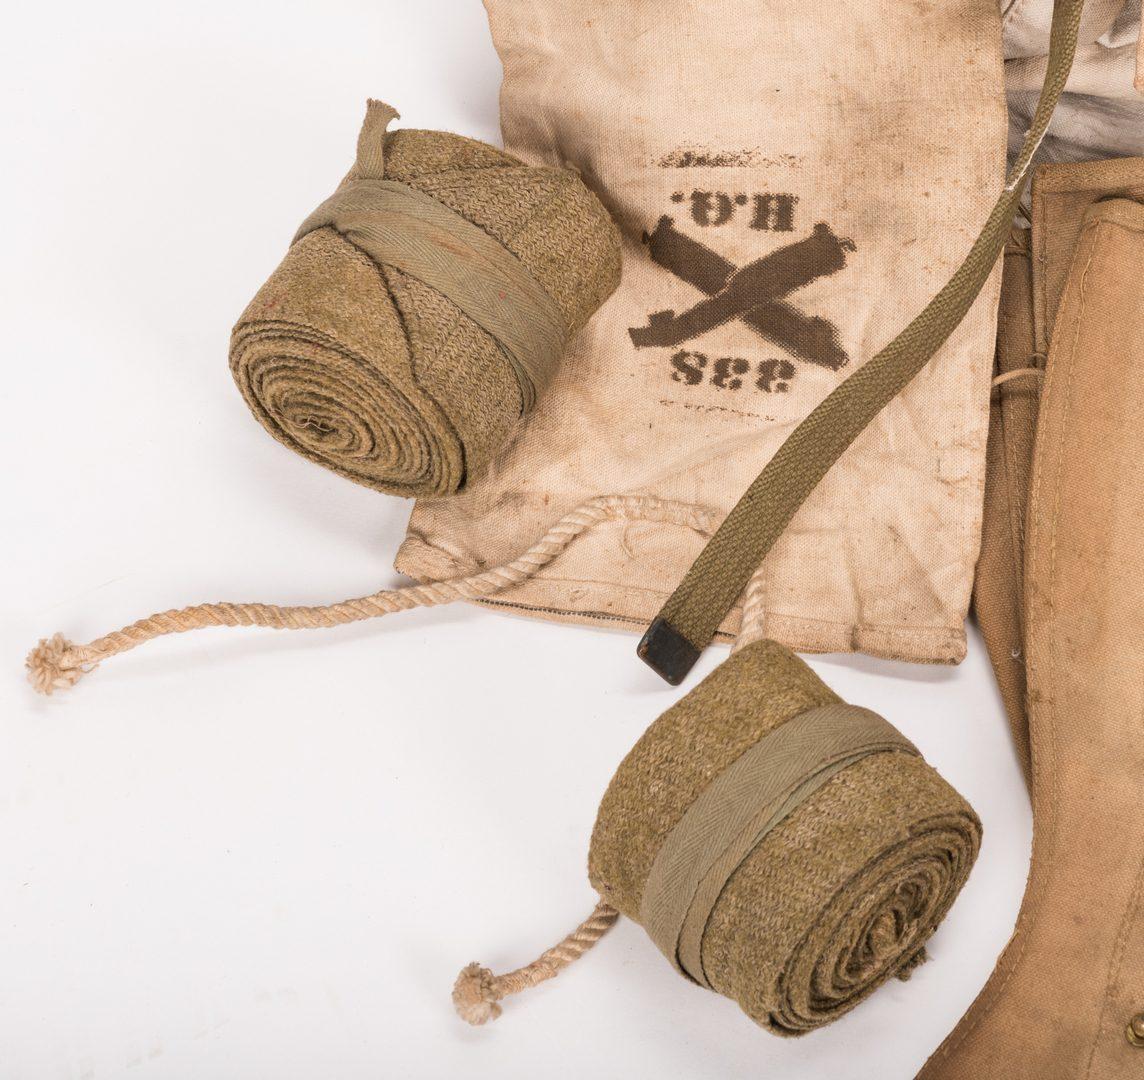 Lot 113: 13 WWI U.S. Military Equipment Items, J. A. Newman